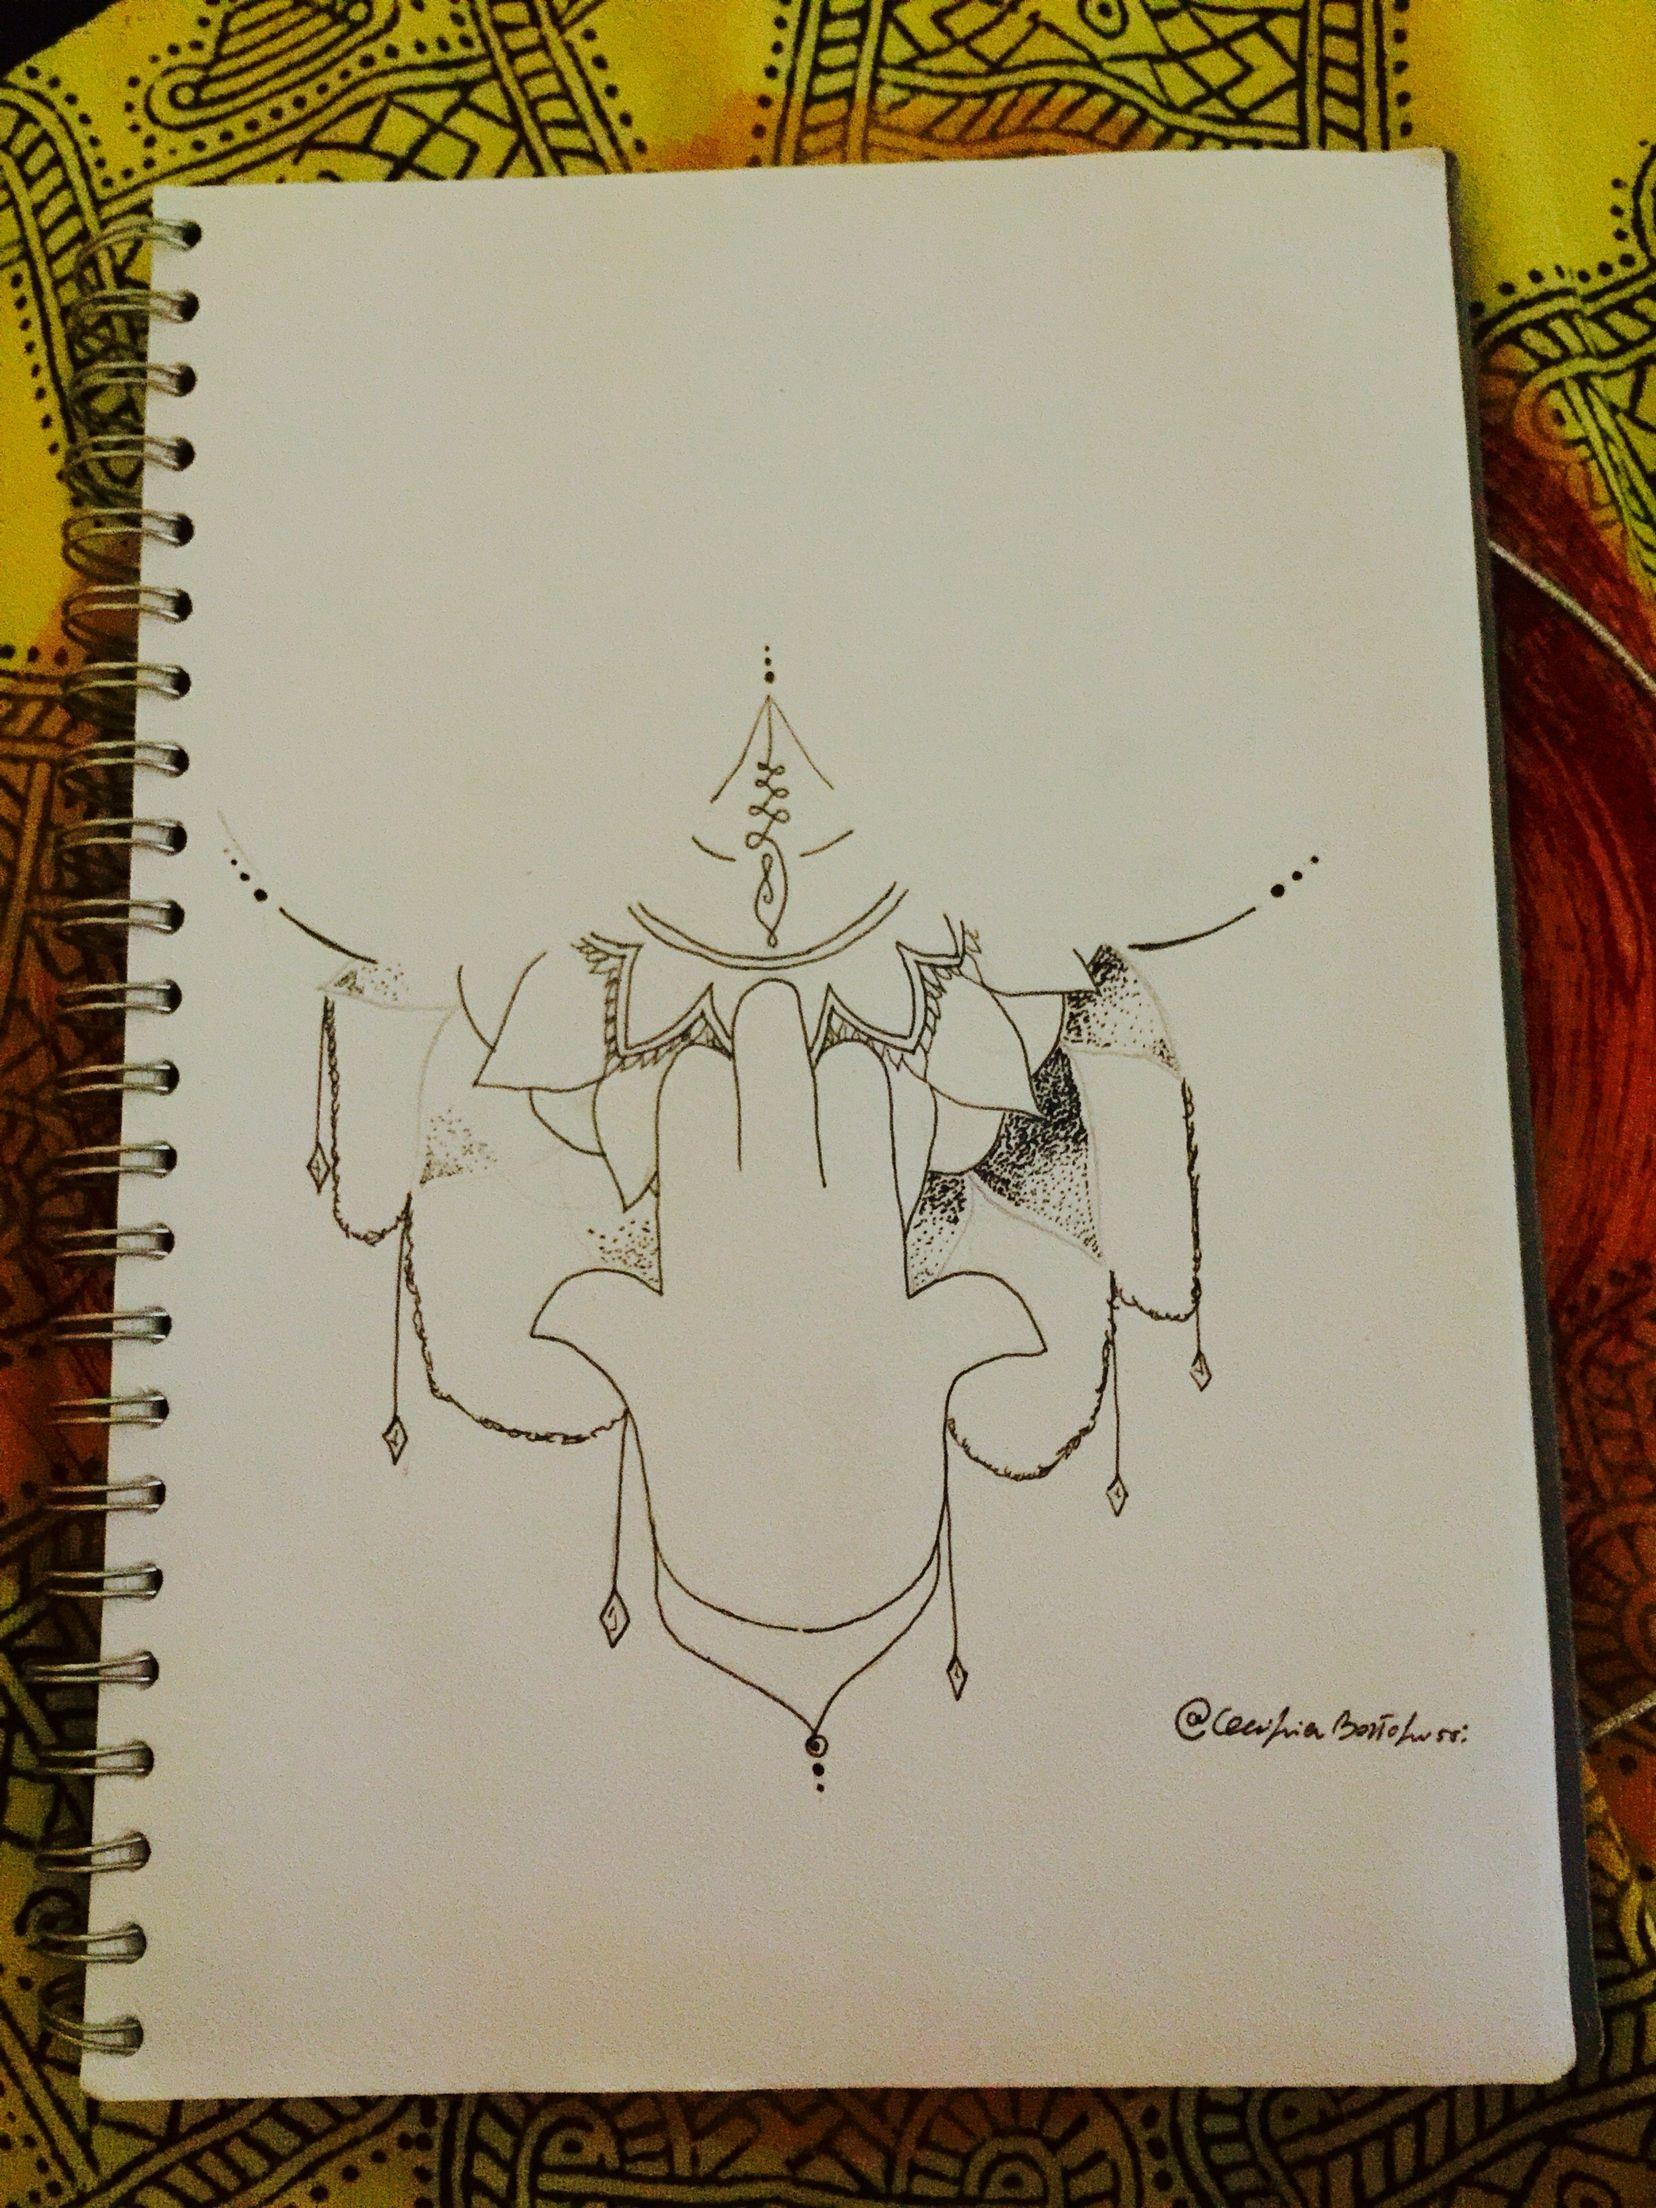 #tattooinmezzoalseno #idee #manodi Fatima #mandala #bortolussigarda